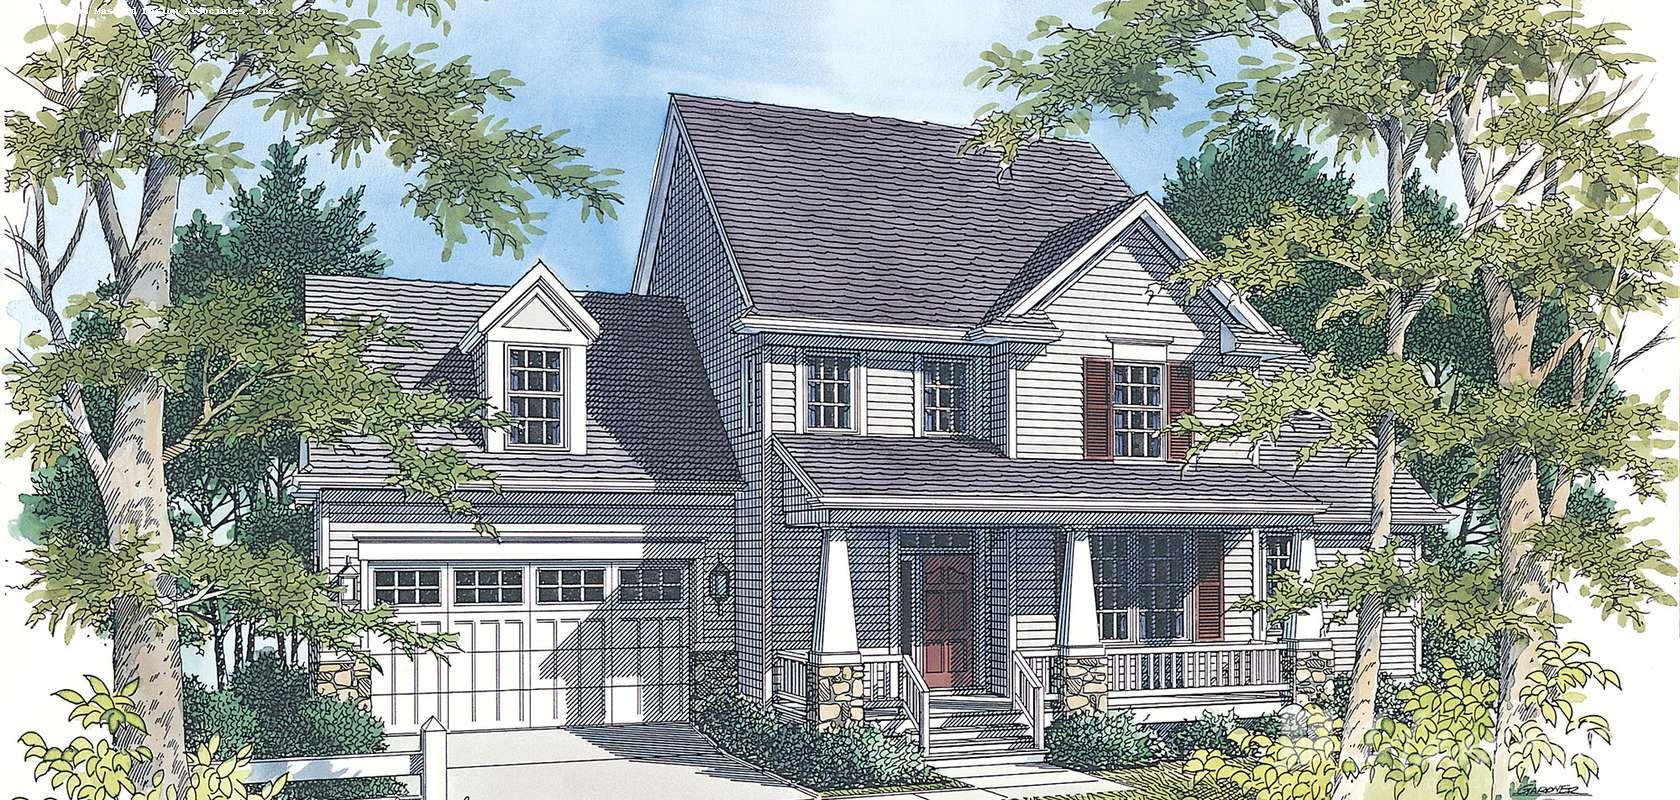 Mascord House Plan 2156: The Mannington